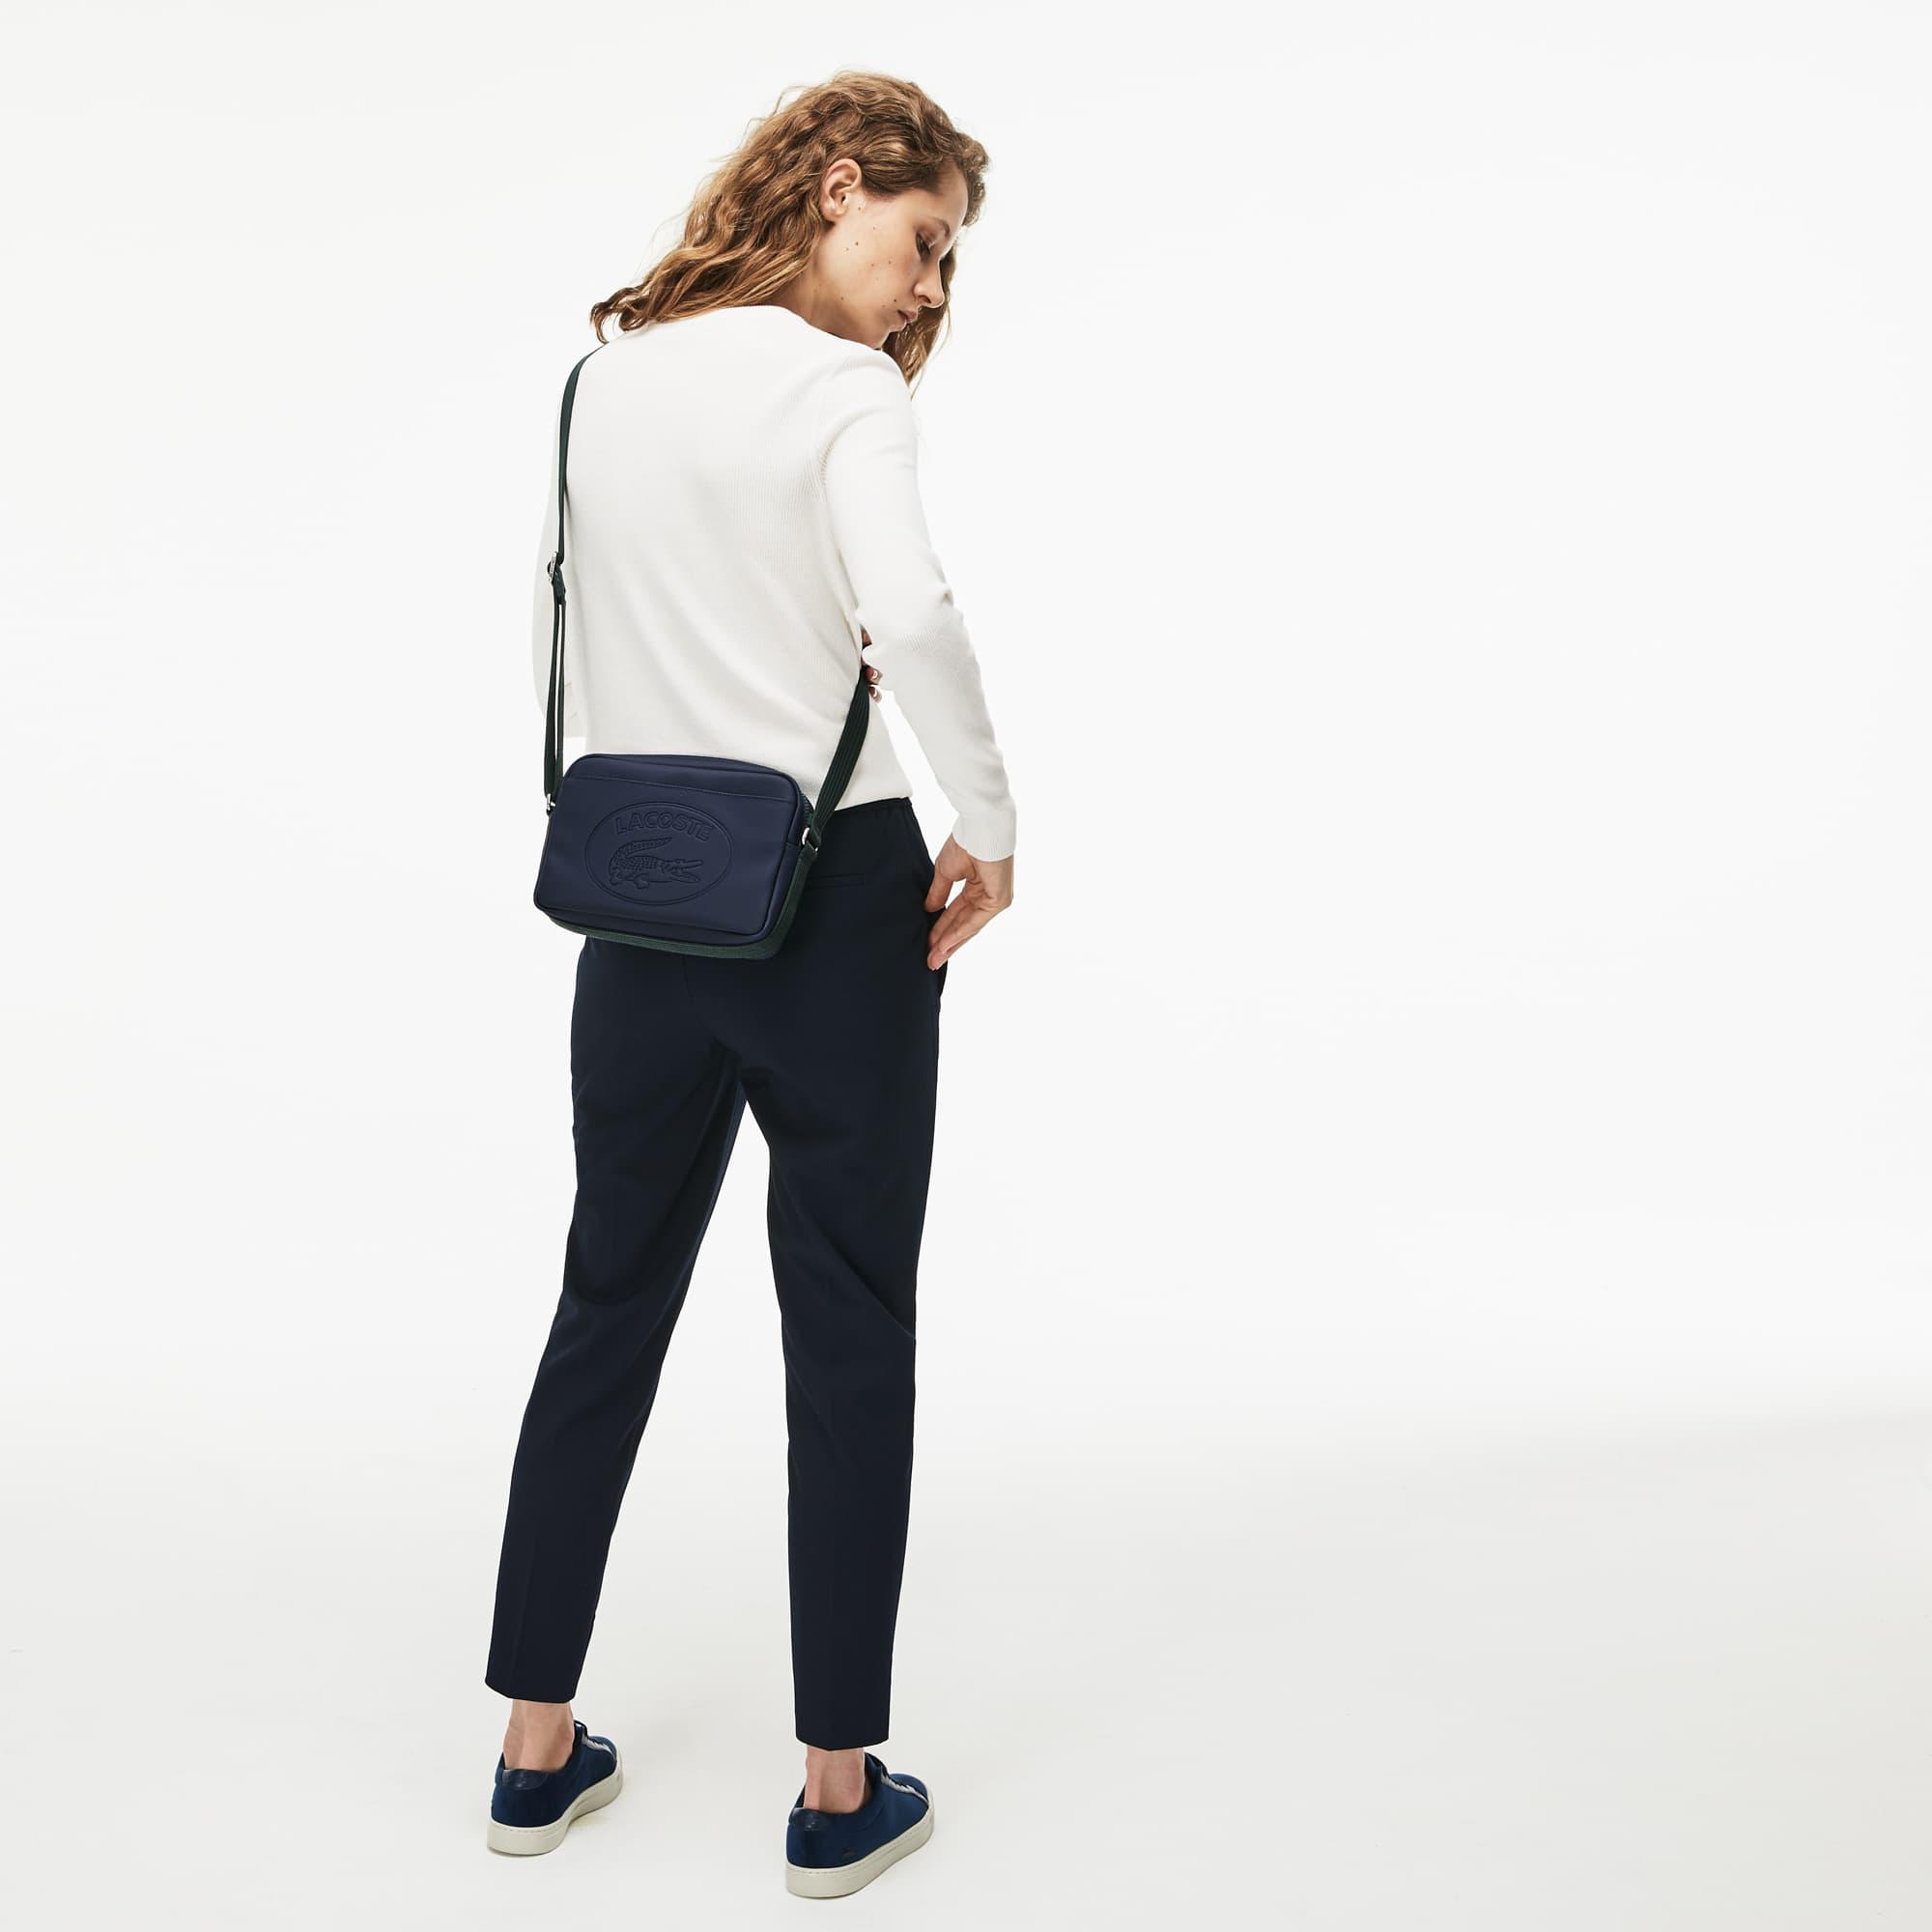 Women's Classic Bicolor Shoulder Bag